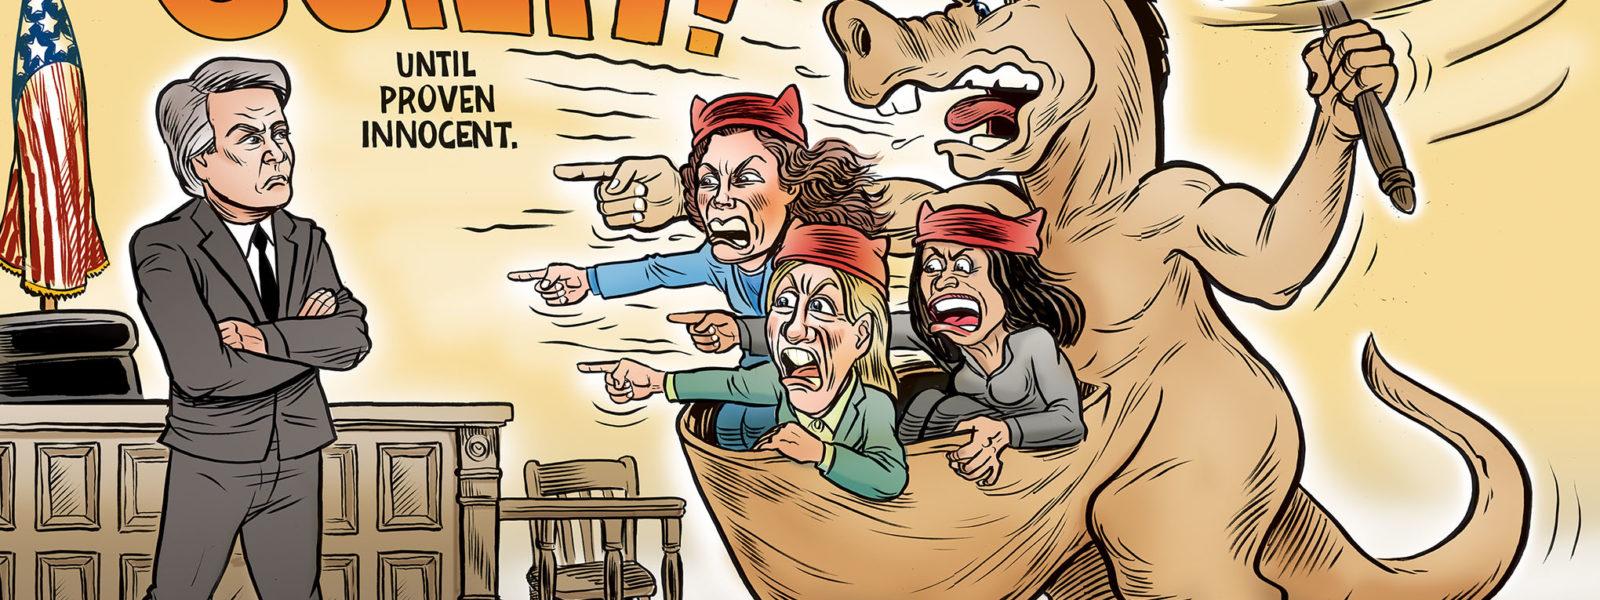 The Democrats' Kangaroo Court